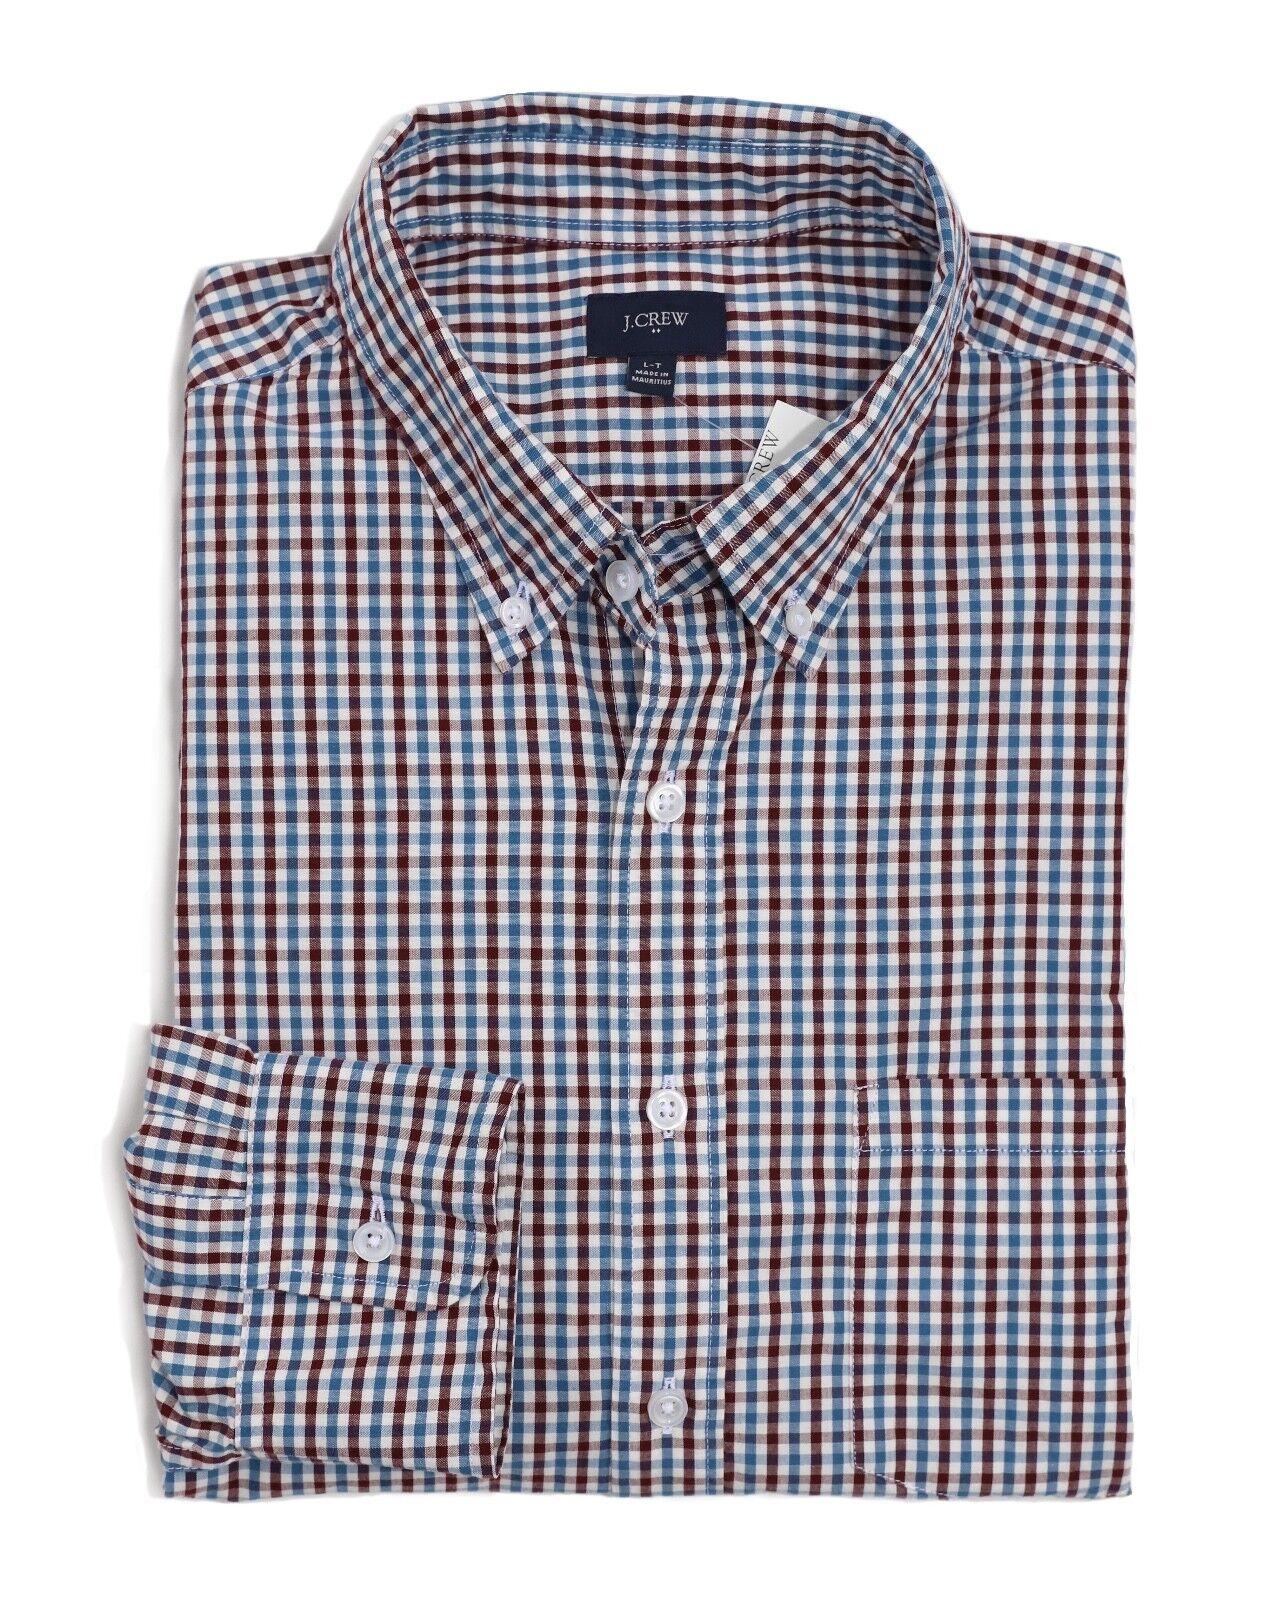 J.Crew Factory Mens XL Tall NWT Maroon Red bluee Micro-Gingham Button-Down Shirt